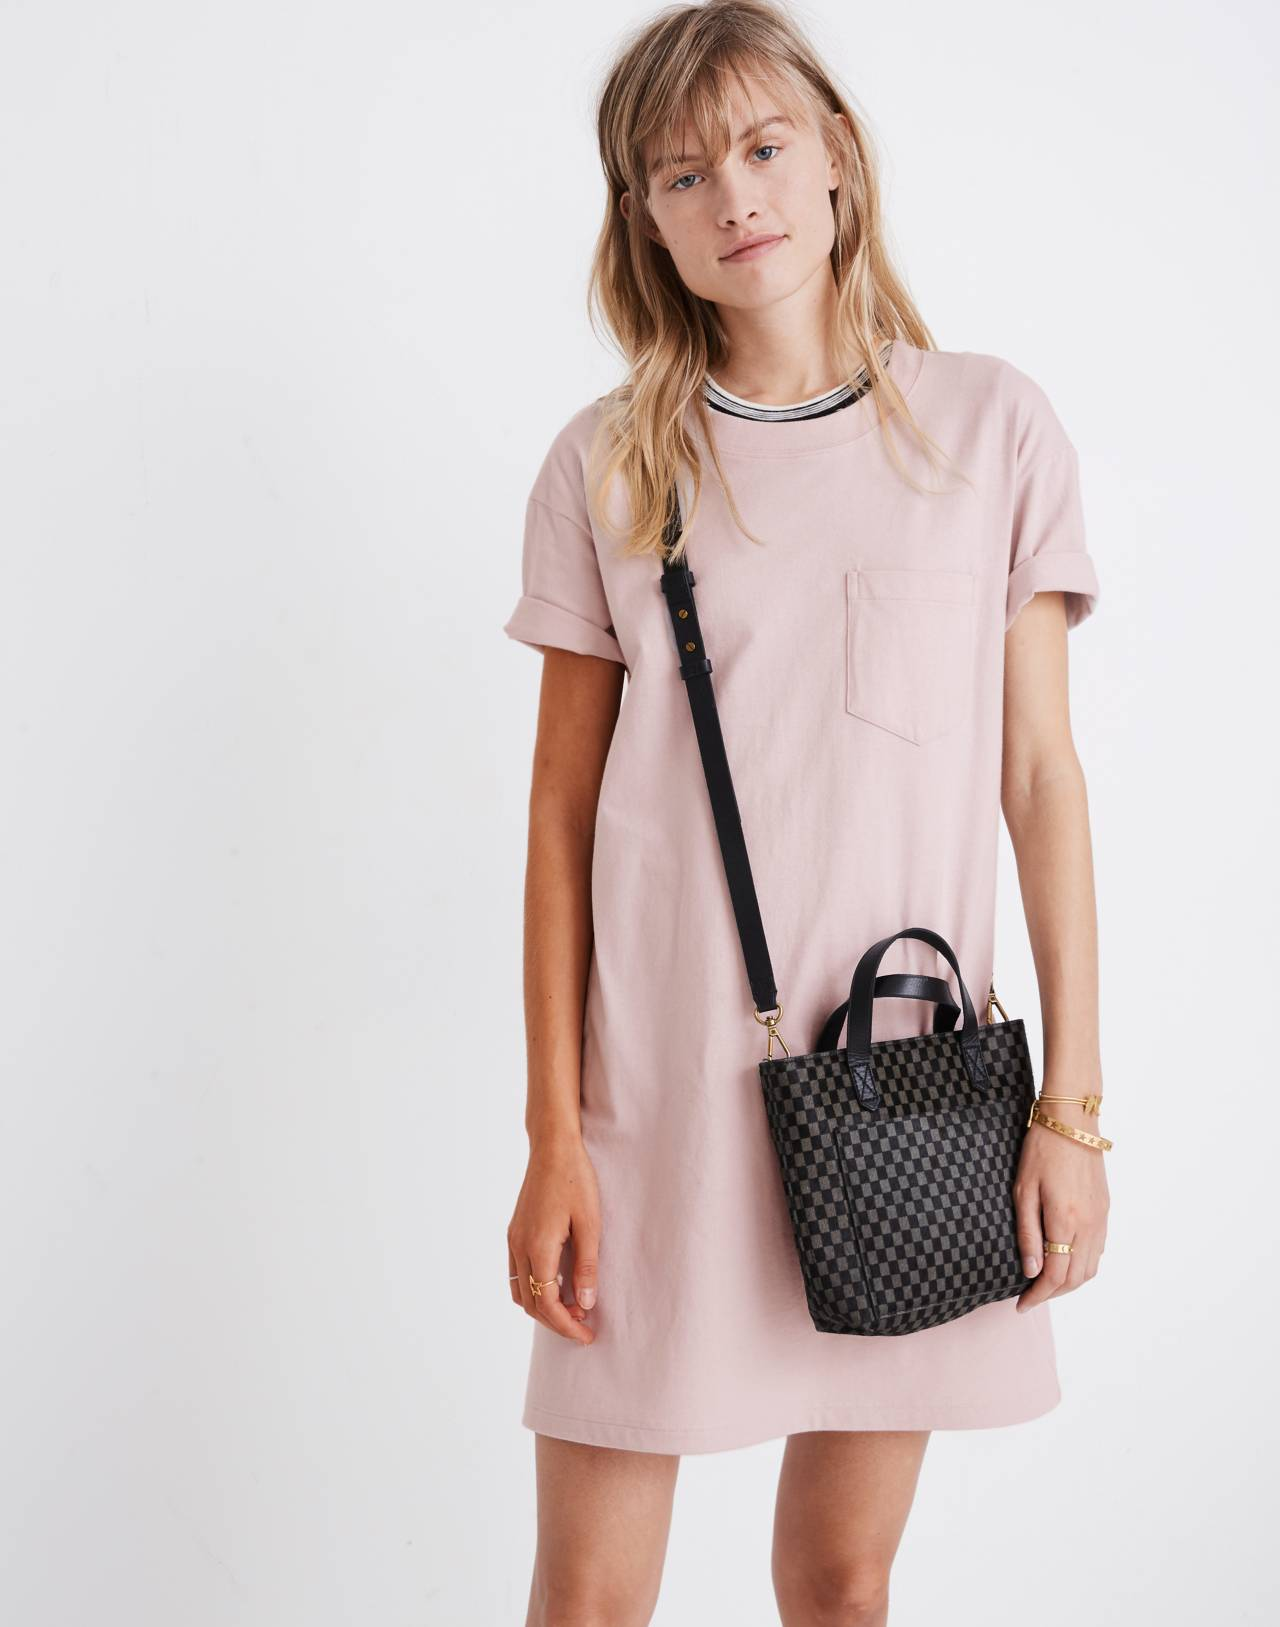 Pocket Tee Dress in wisteria dove image 1